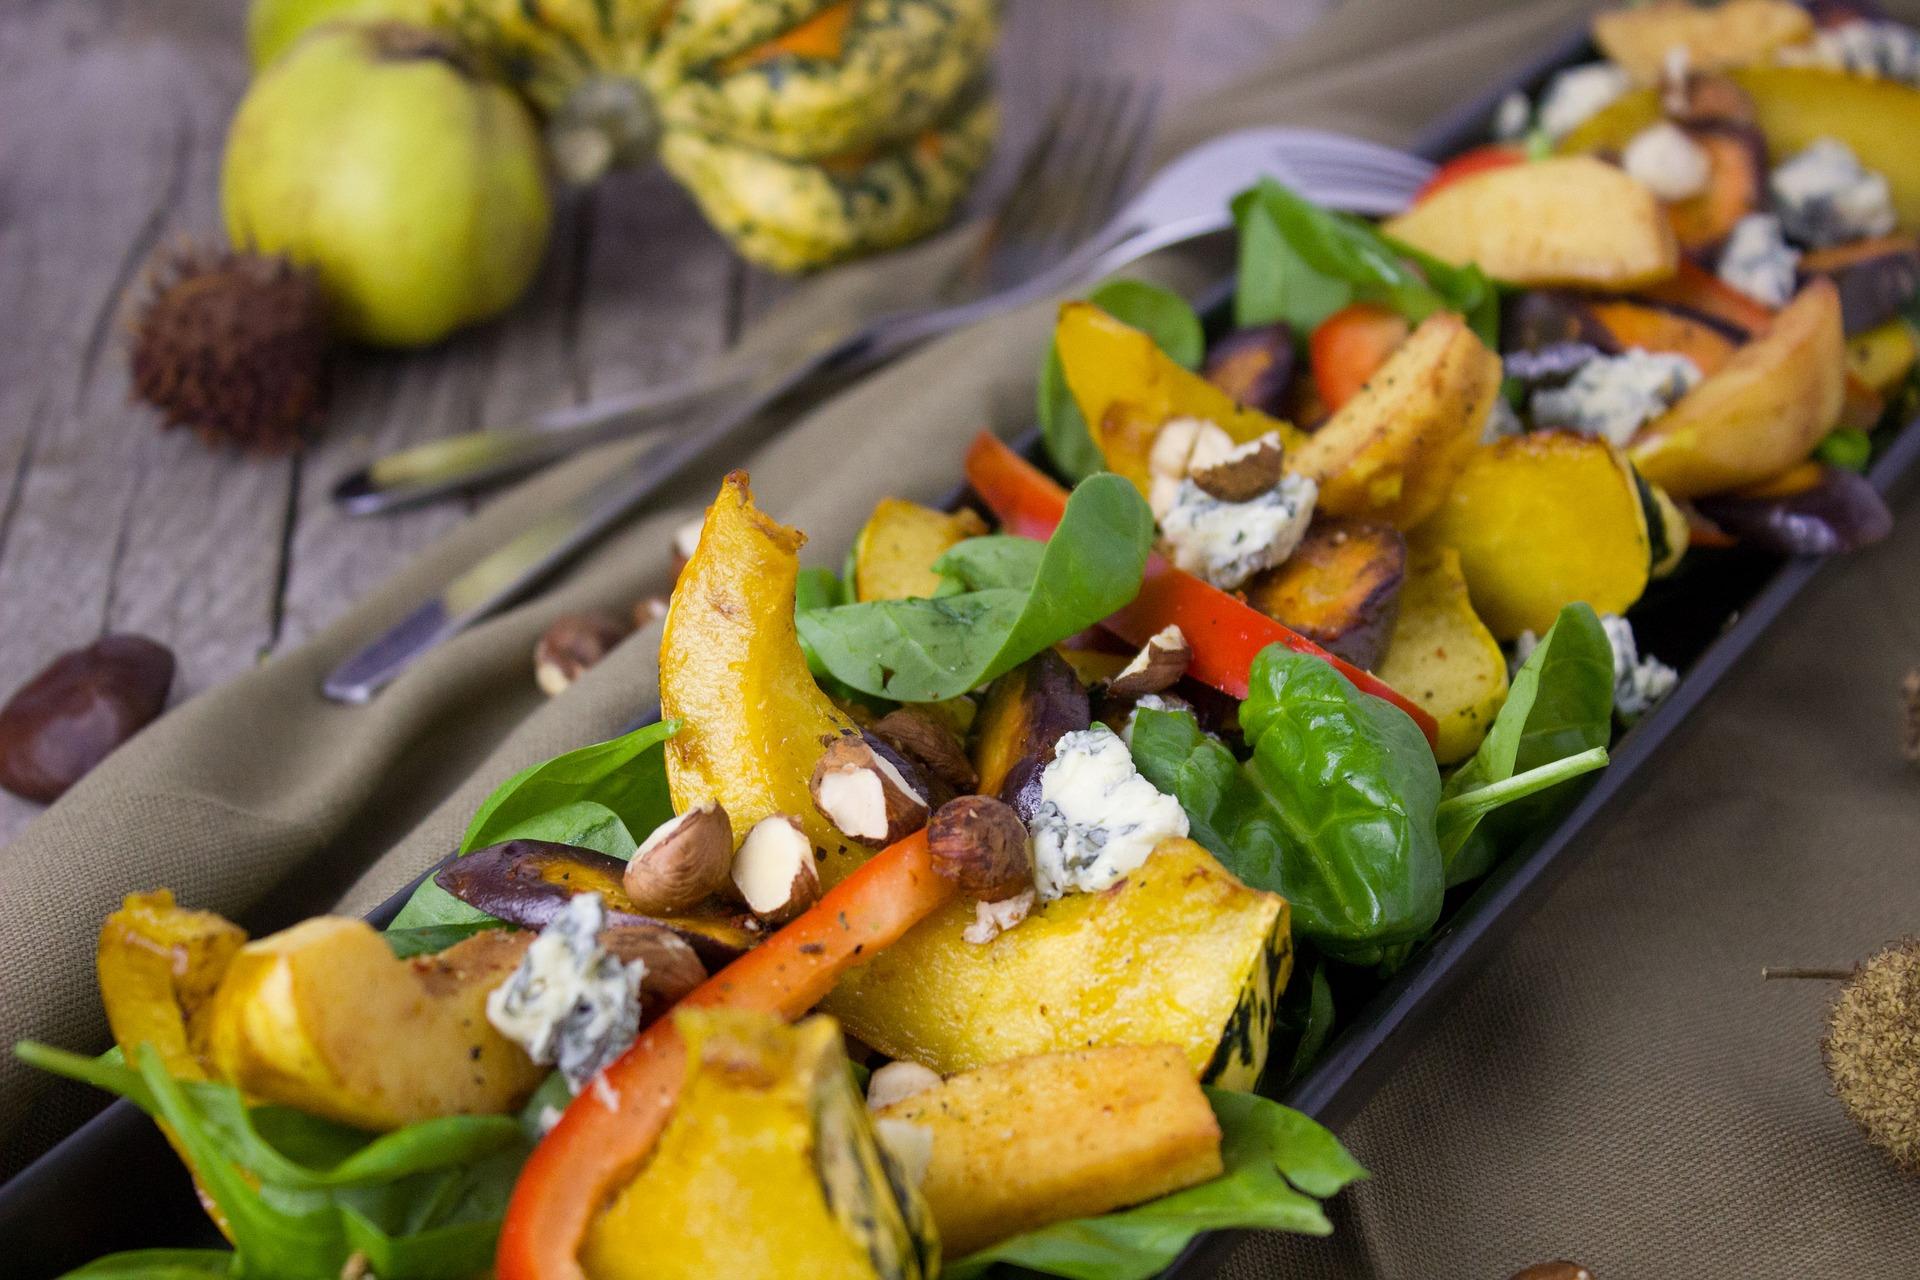 Vegetarian Diet for Beginners